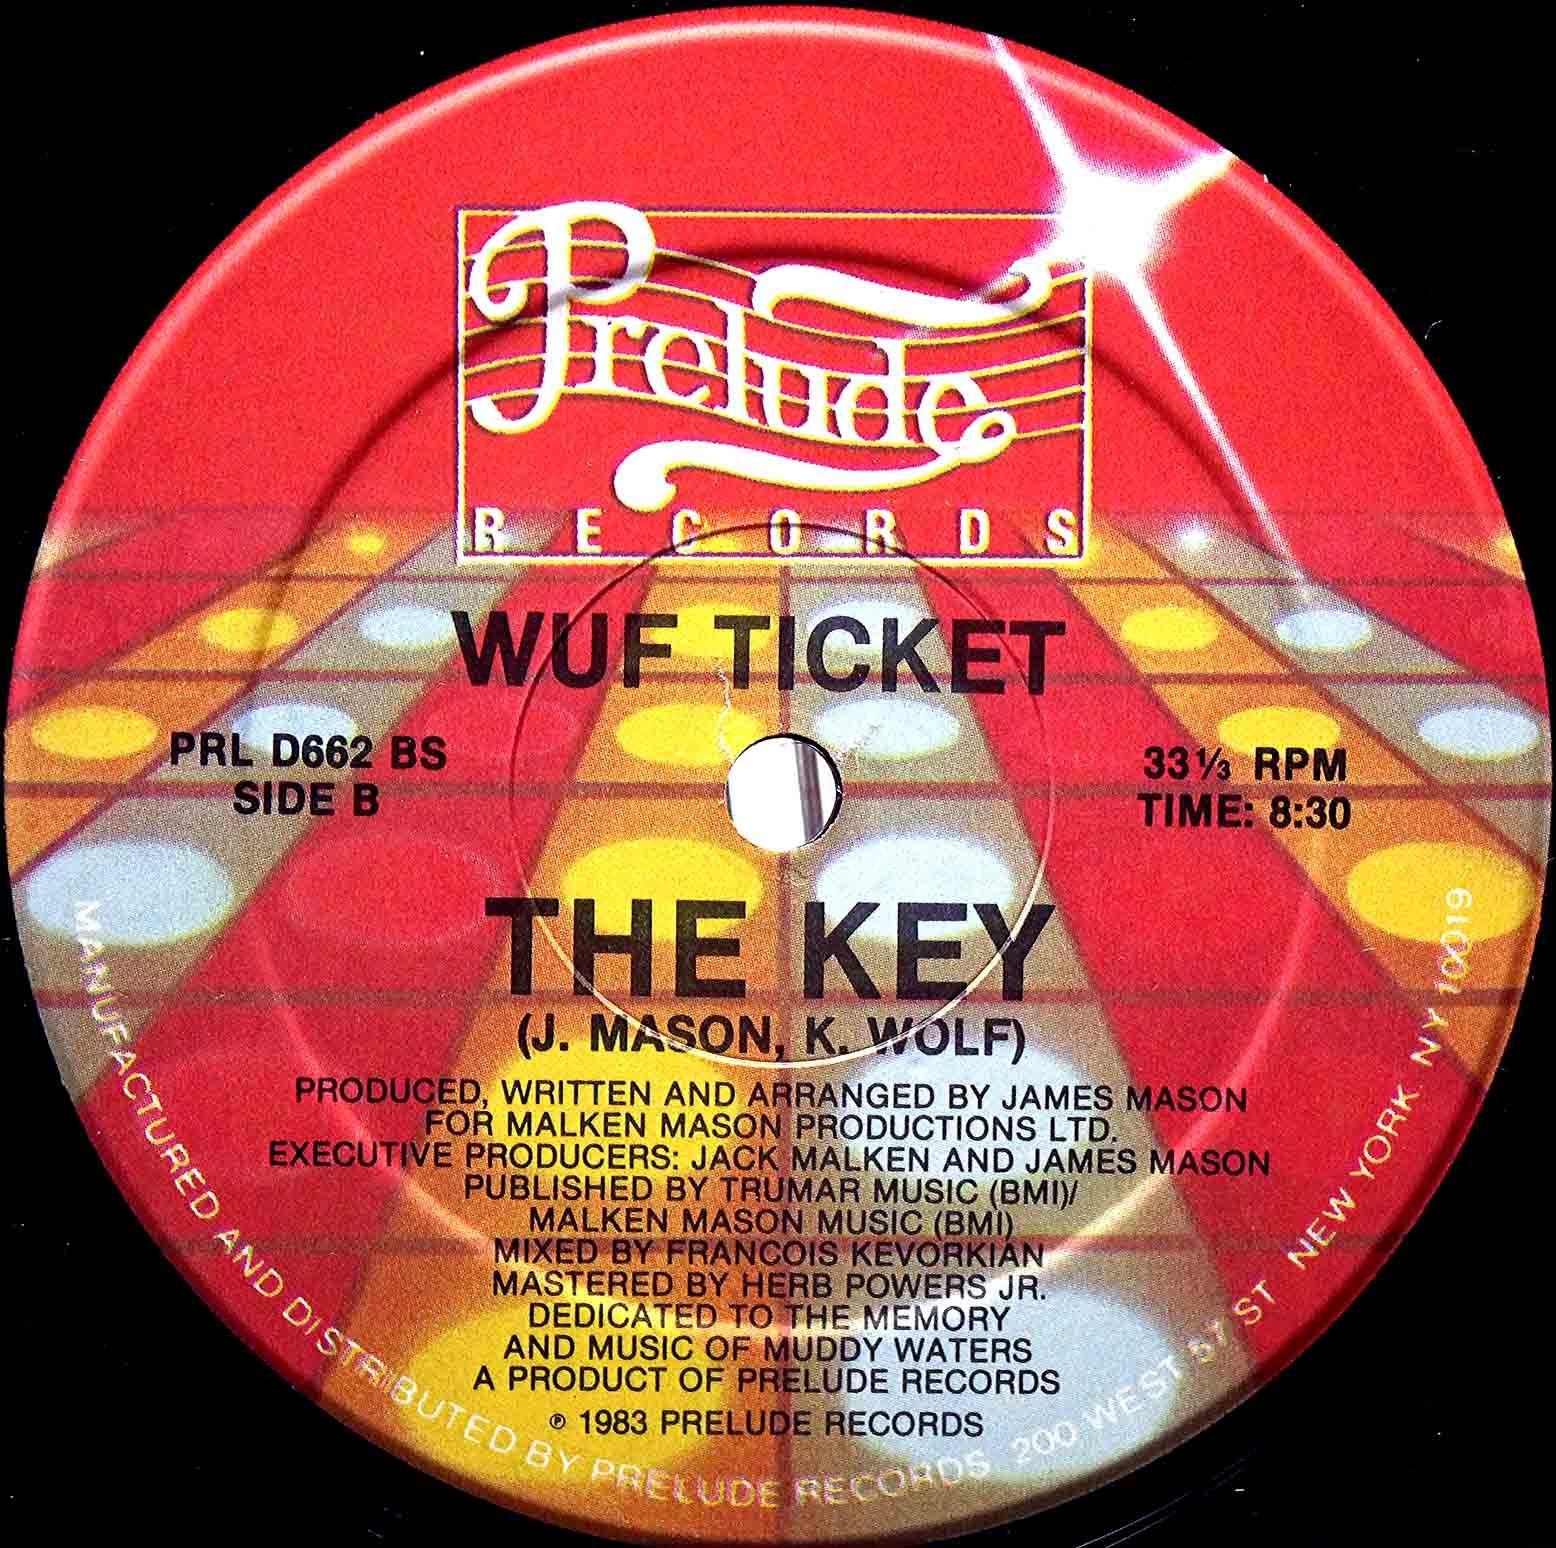 Wuf Ticket – The Key 04